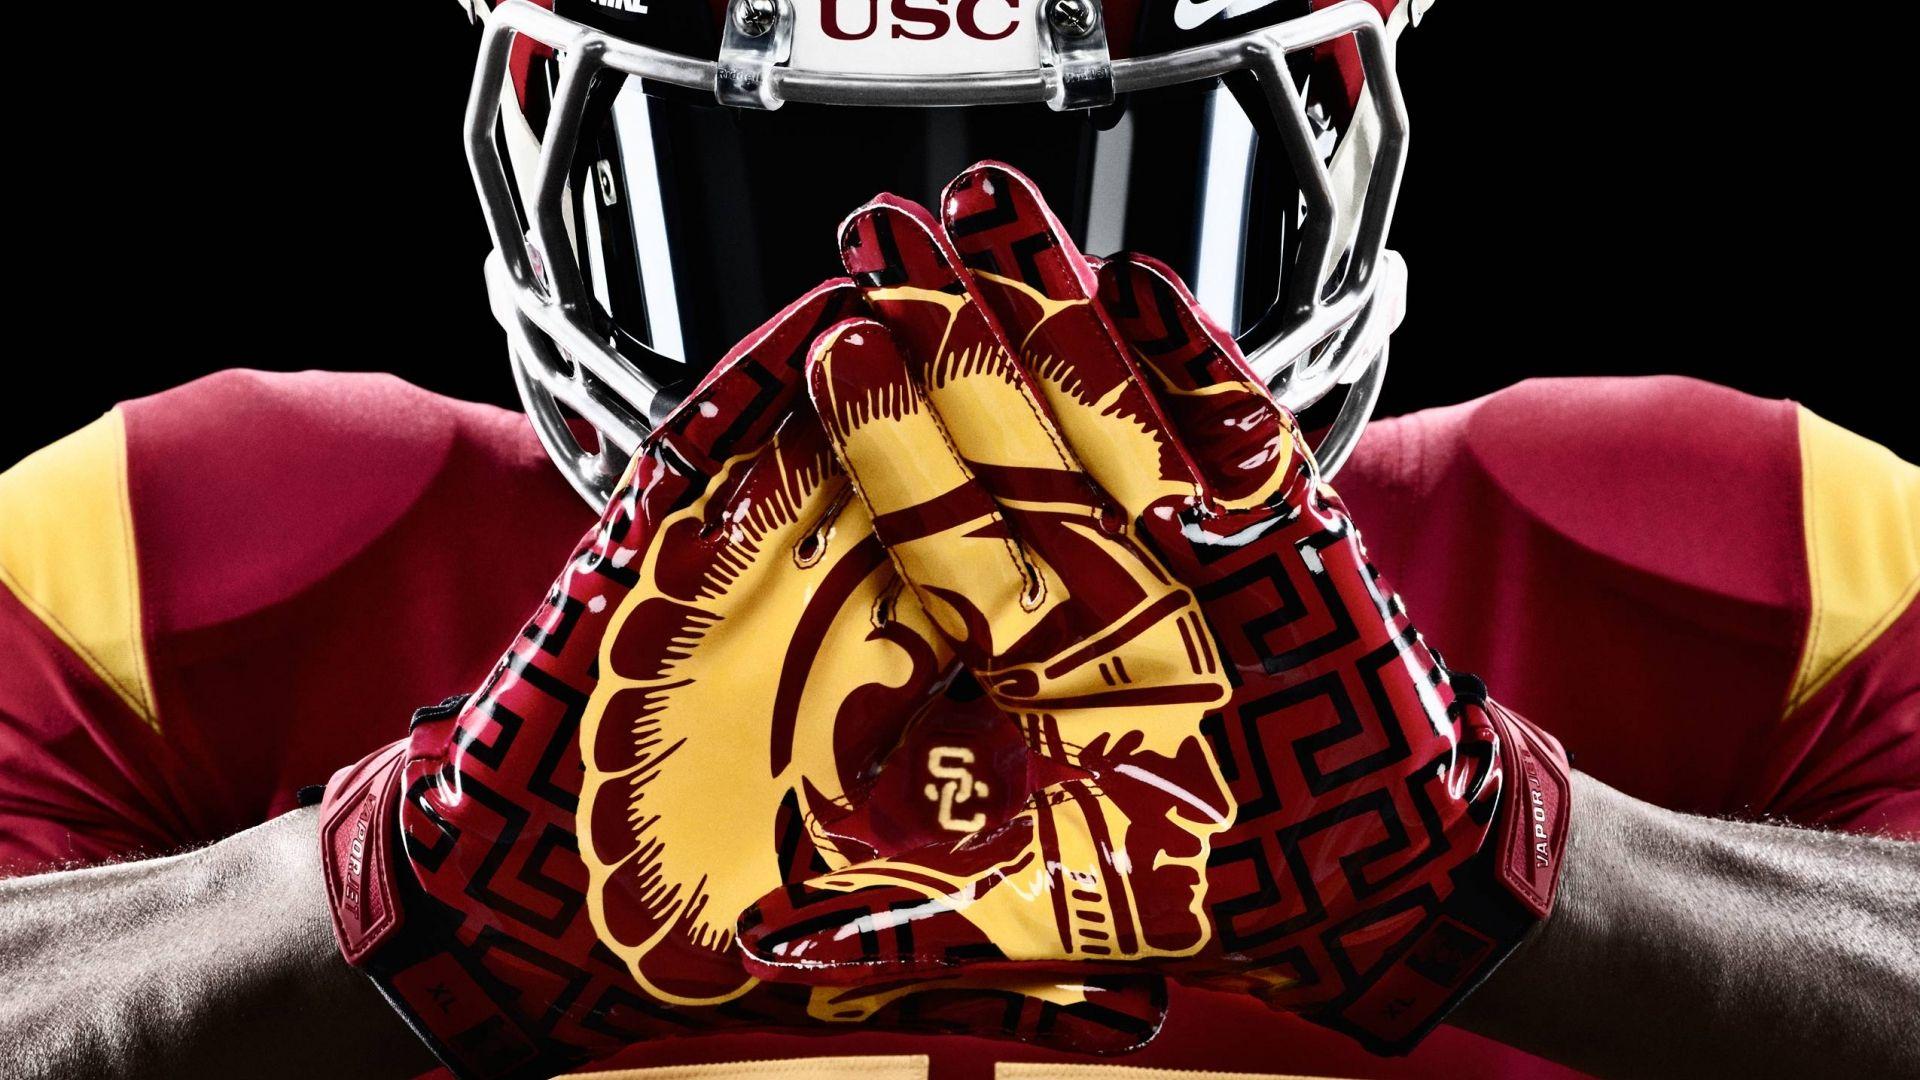 USC Free Desktop Wallpaper